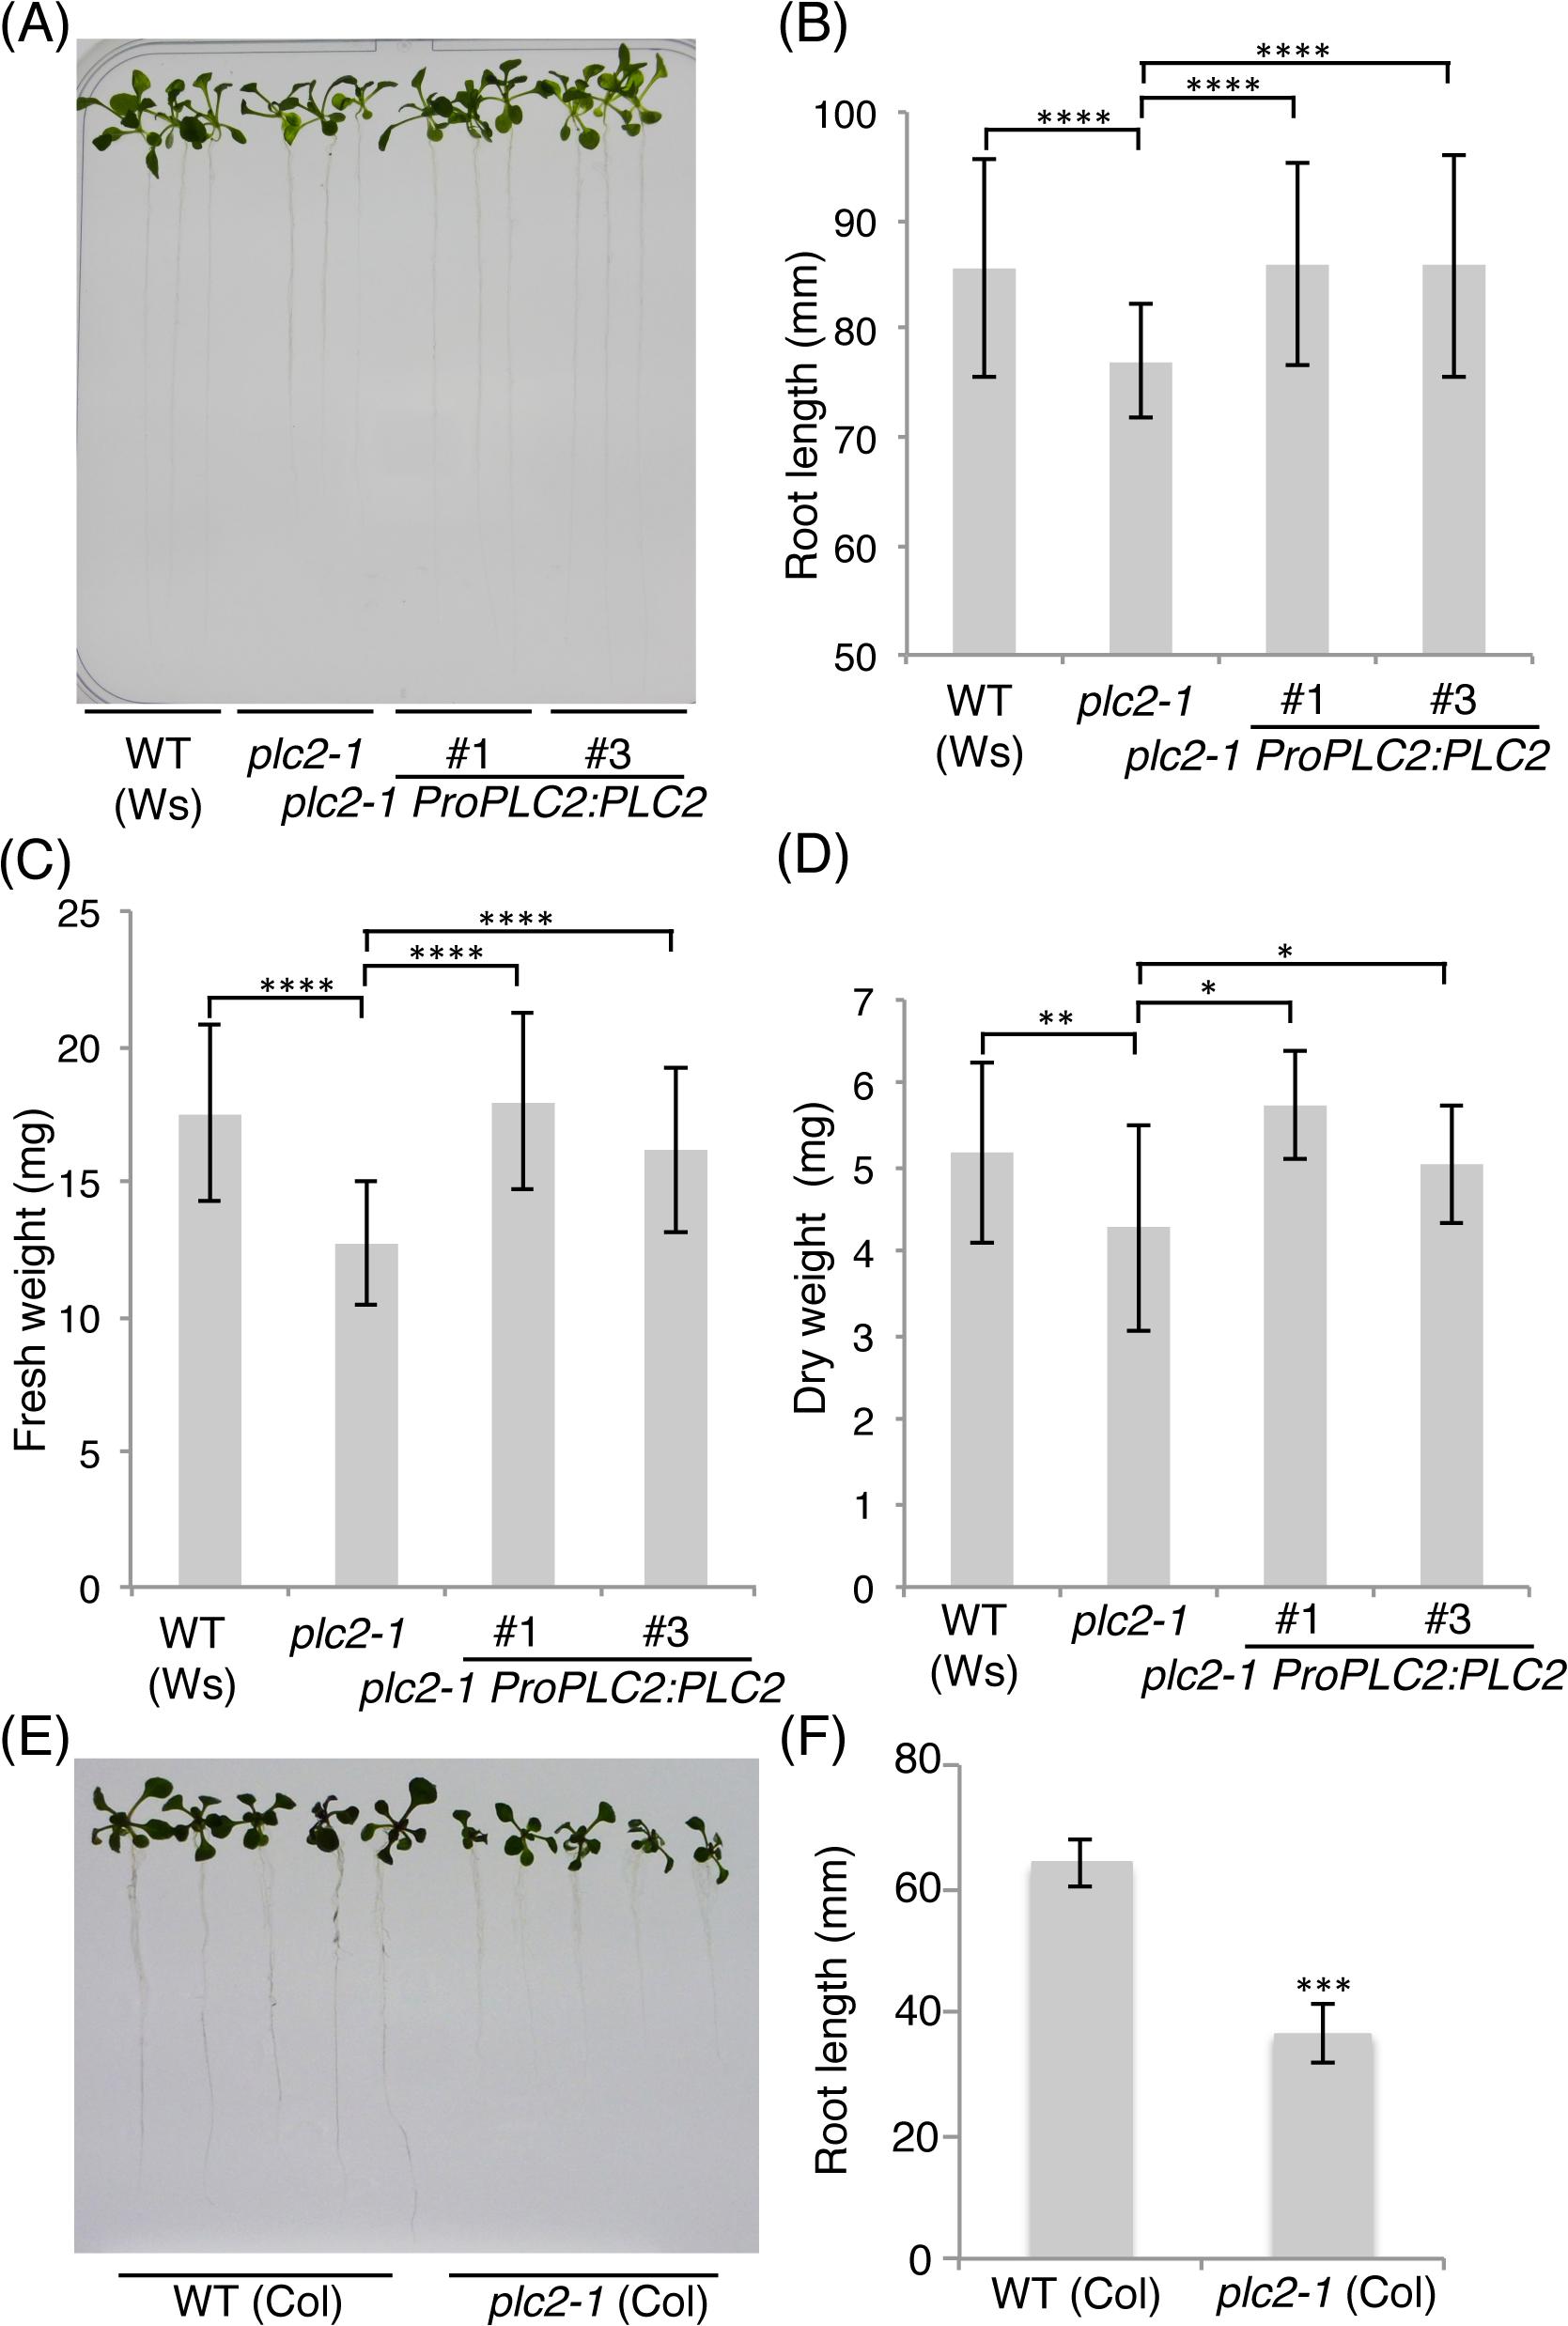 Seedling growth defect of the <i>plc2-1</i> mutant.